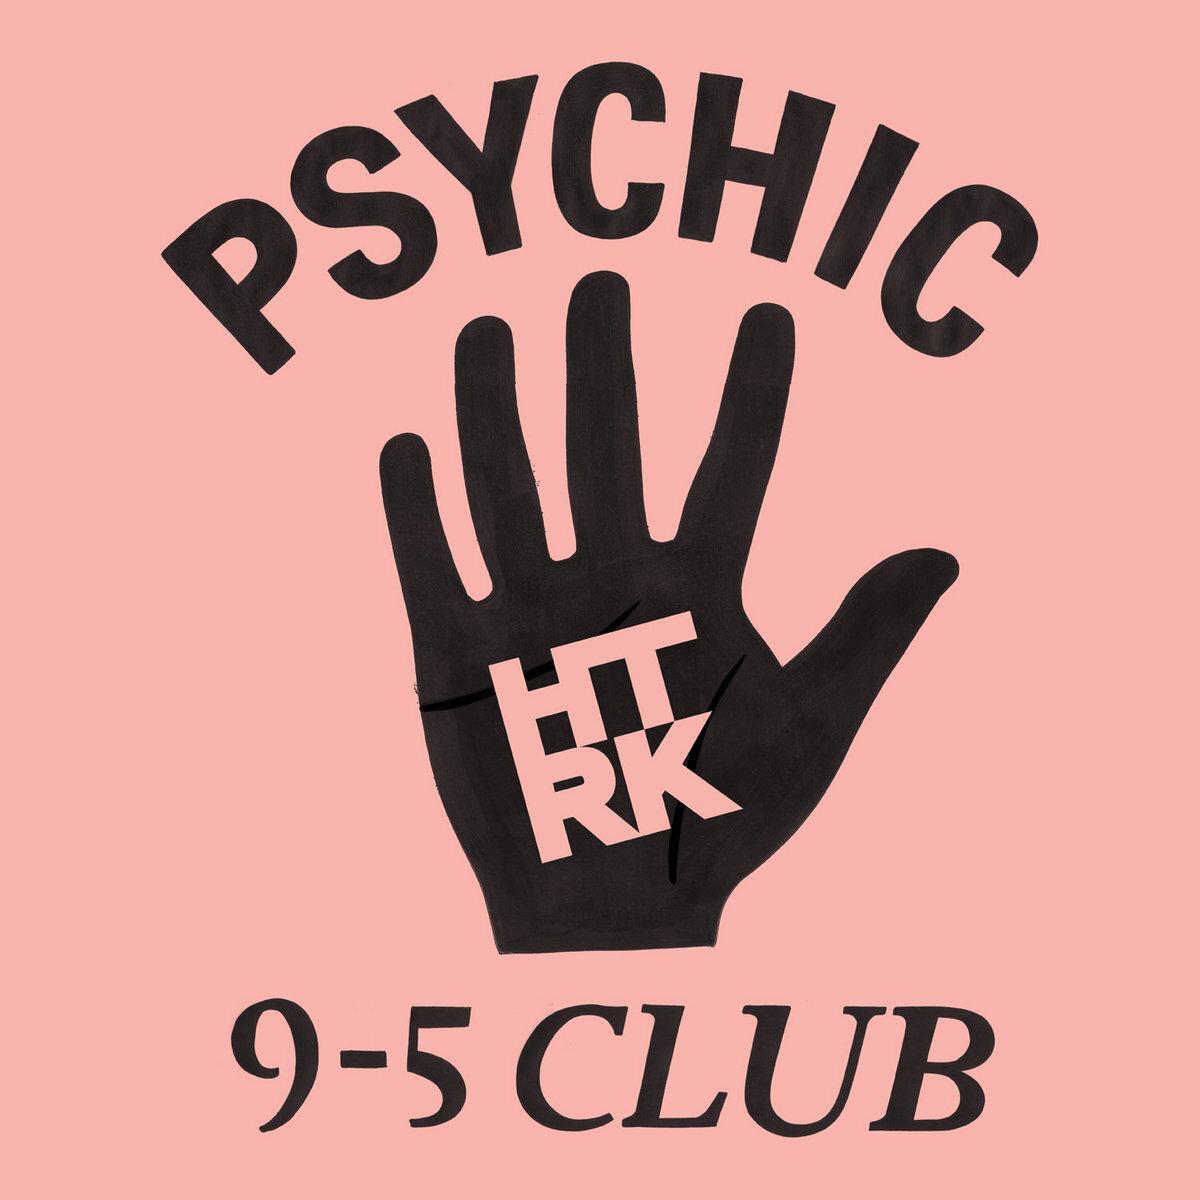 HTRK - Psychic 9-5 Club (LP)